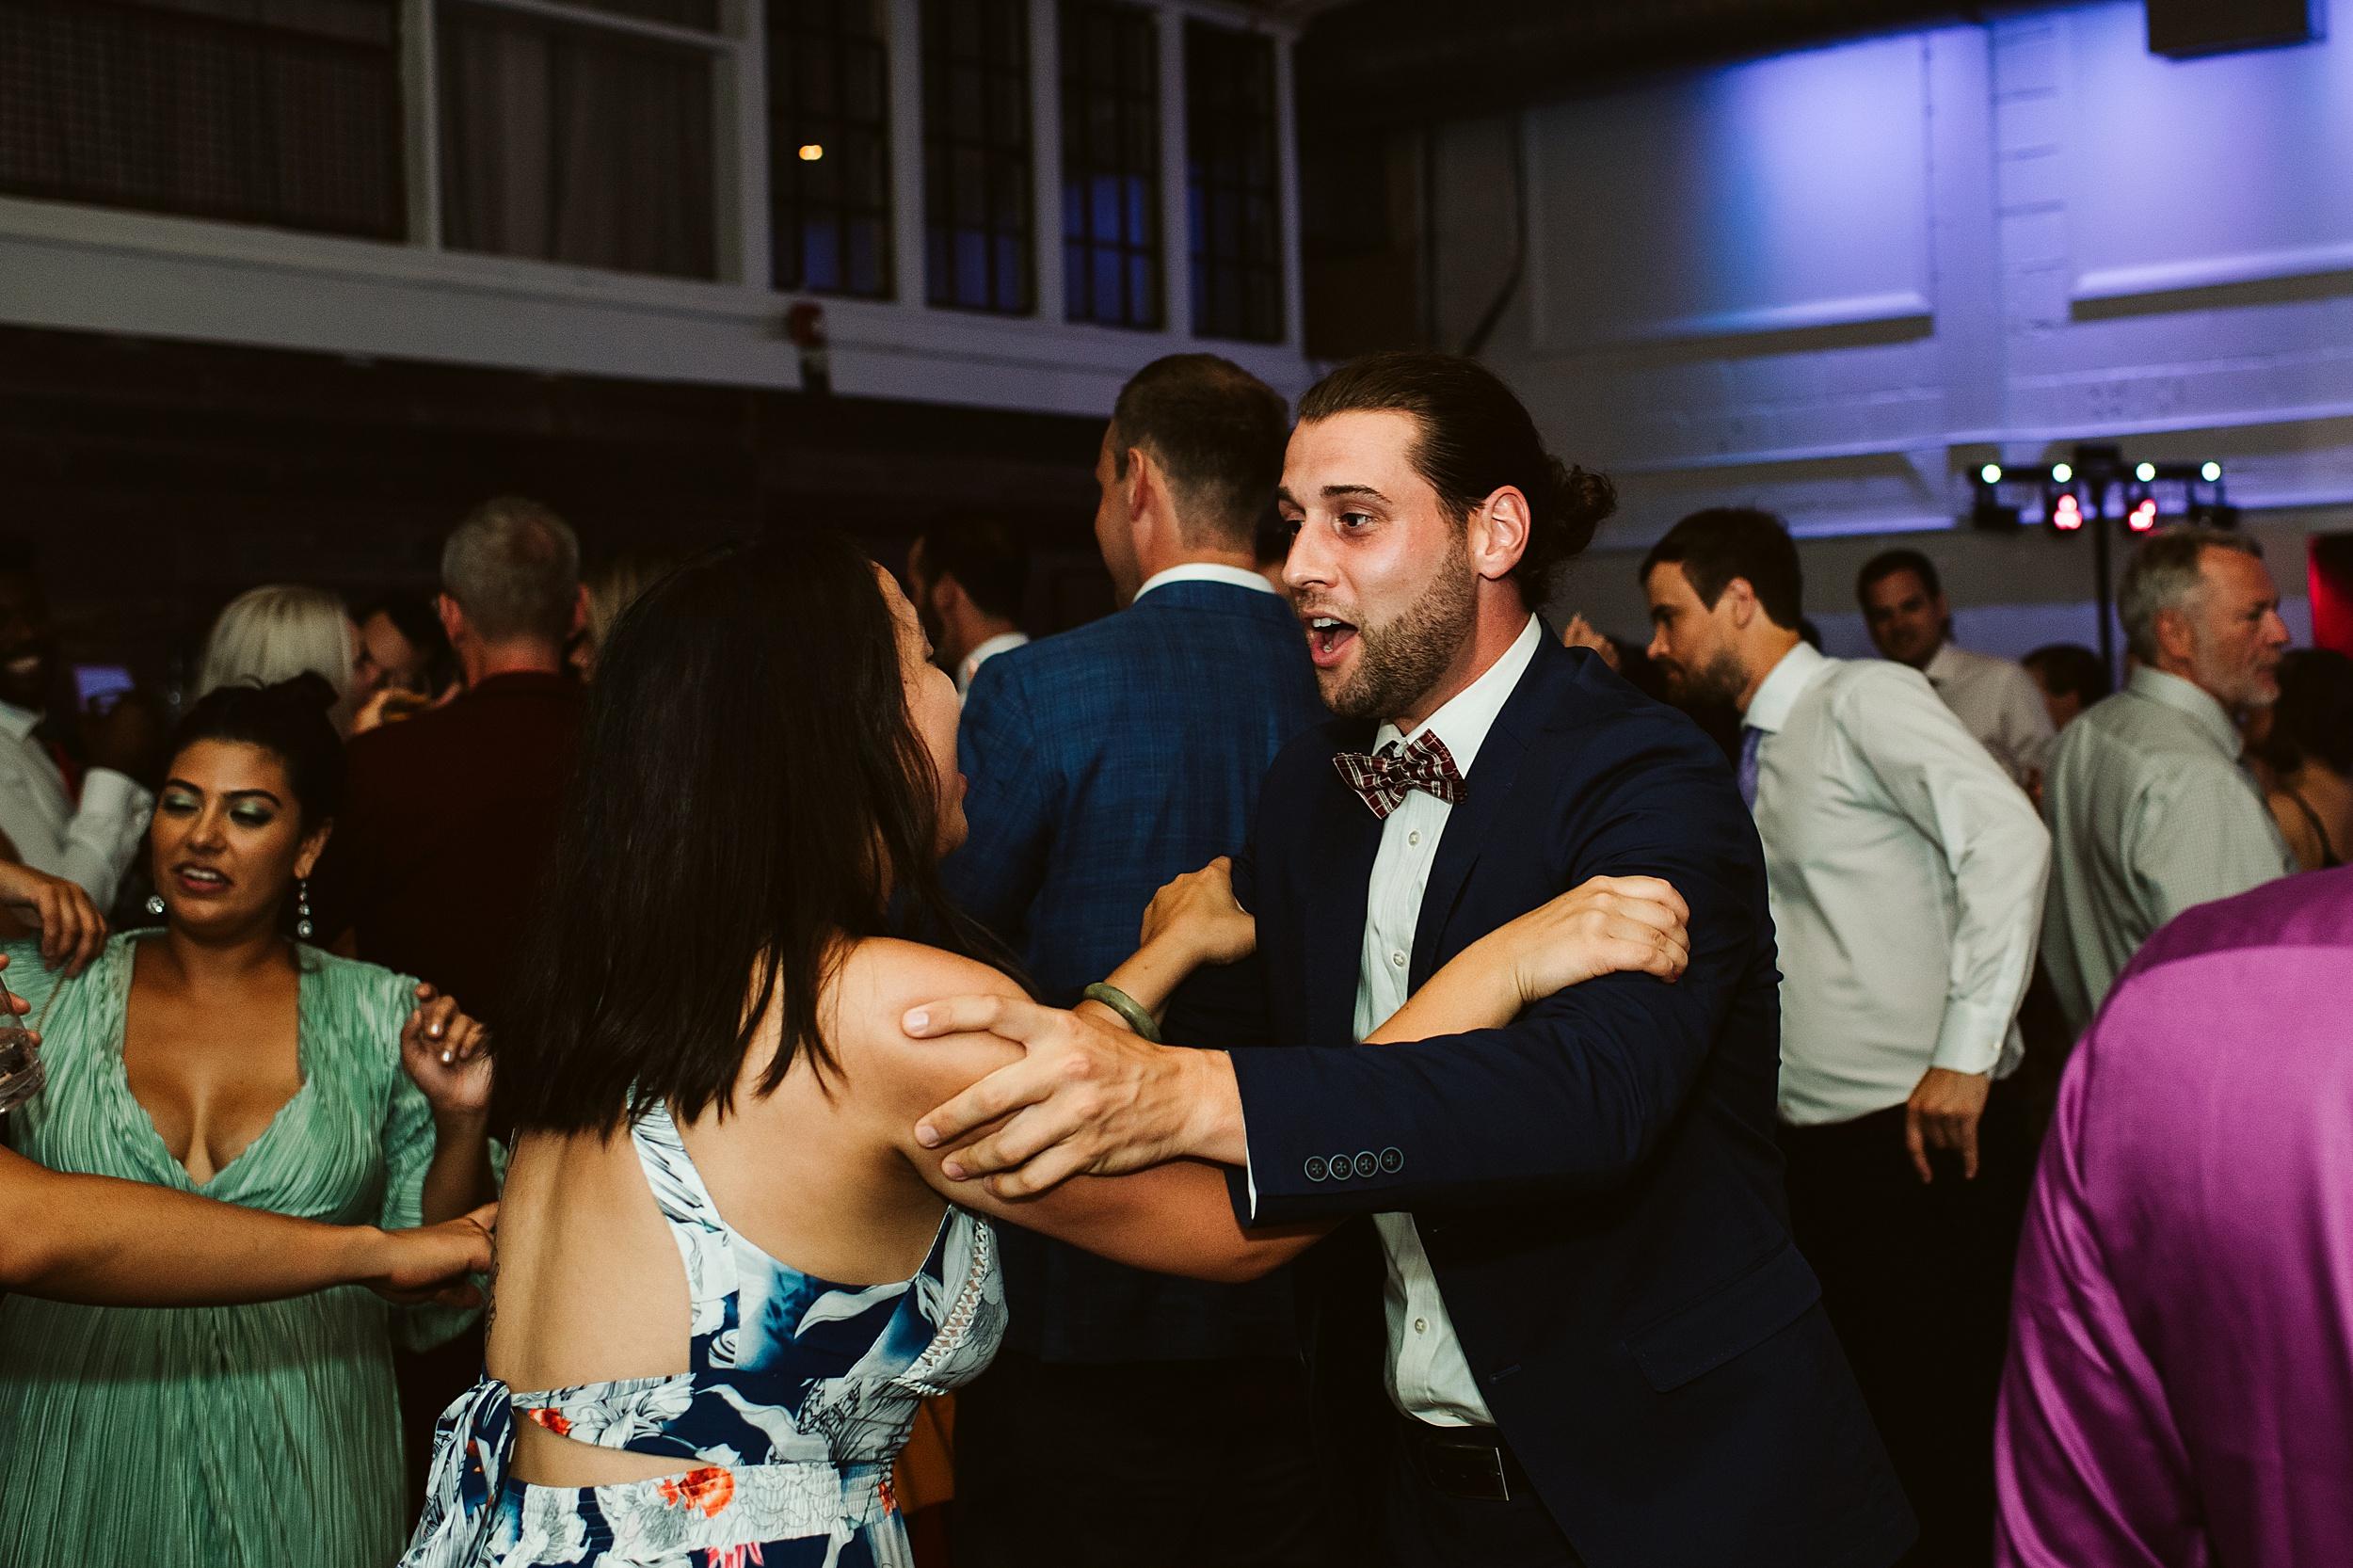 Airship-37-Berkeley-Events-Distillery-District-Wedding-Toronto-Wedding-Photographers_0101.jpg